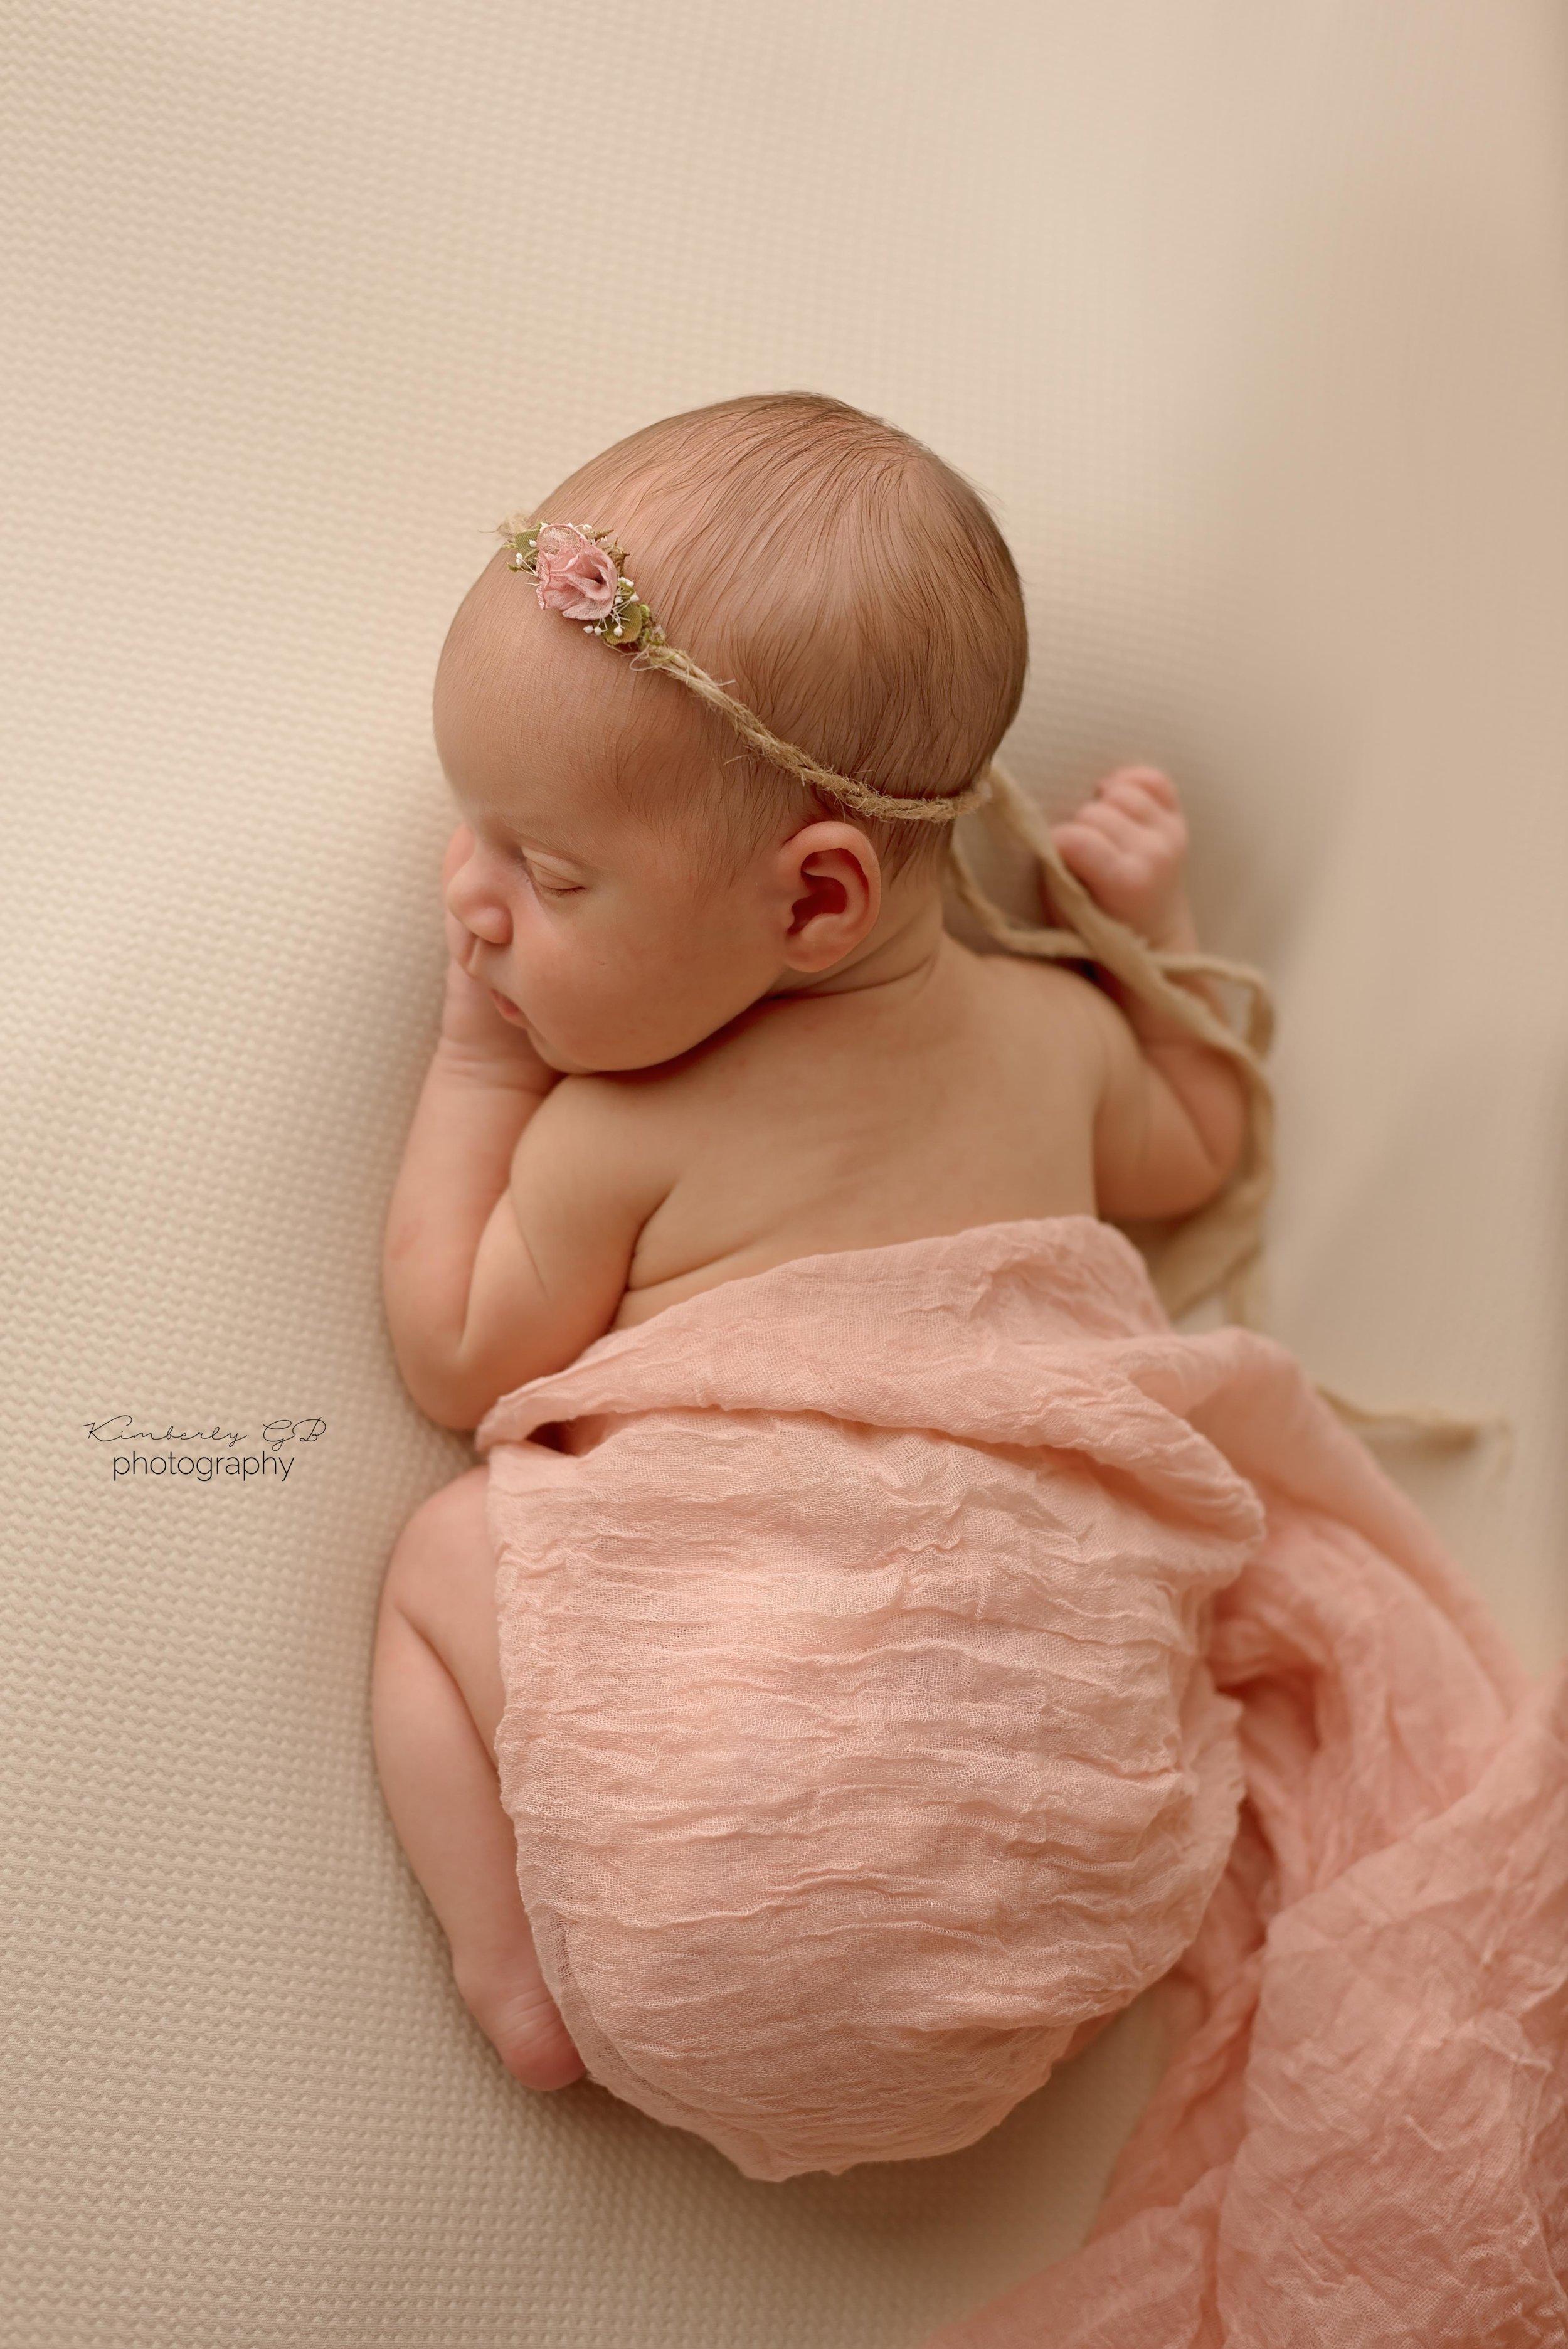 fotografia-de-recien-nacidos-bebes-newborn-en-puerto-rico-kimberly-gb-photography-fotografa-166.jpg